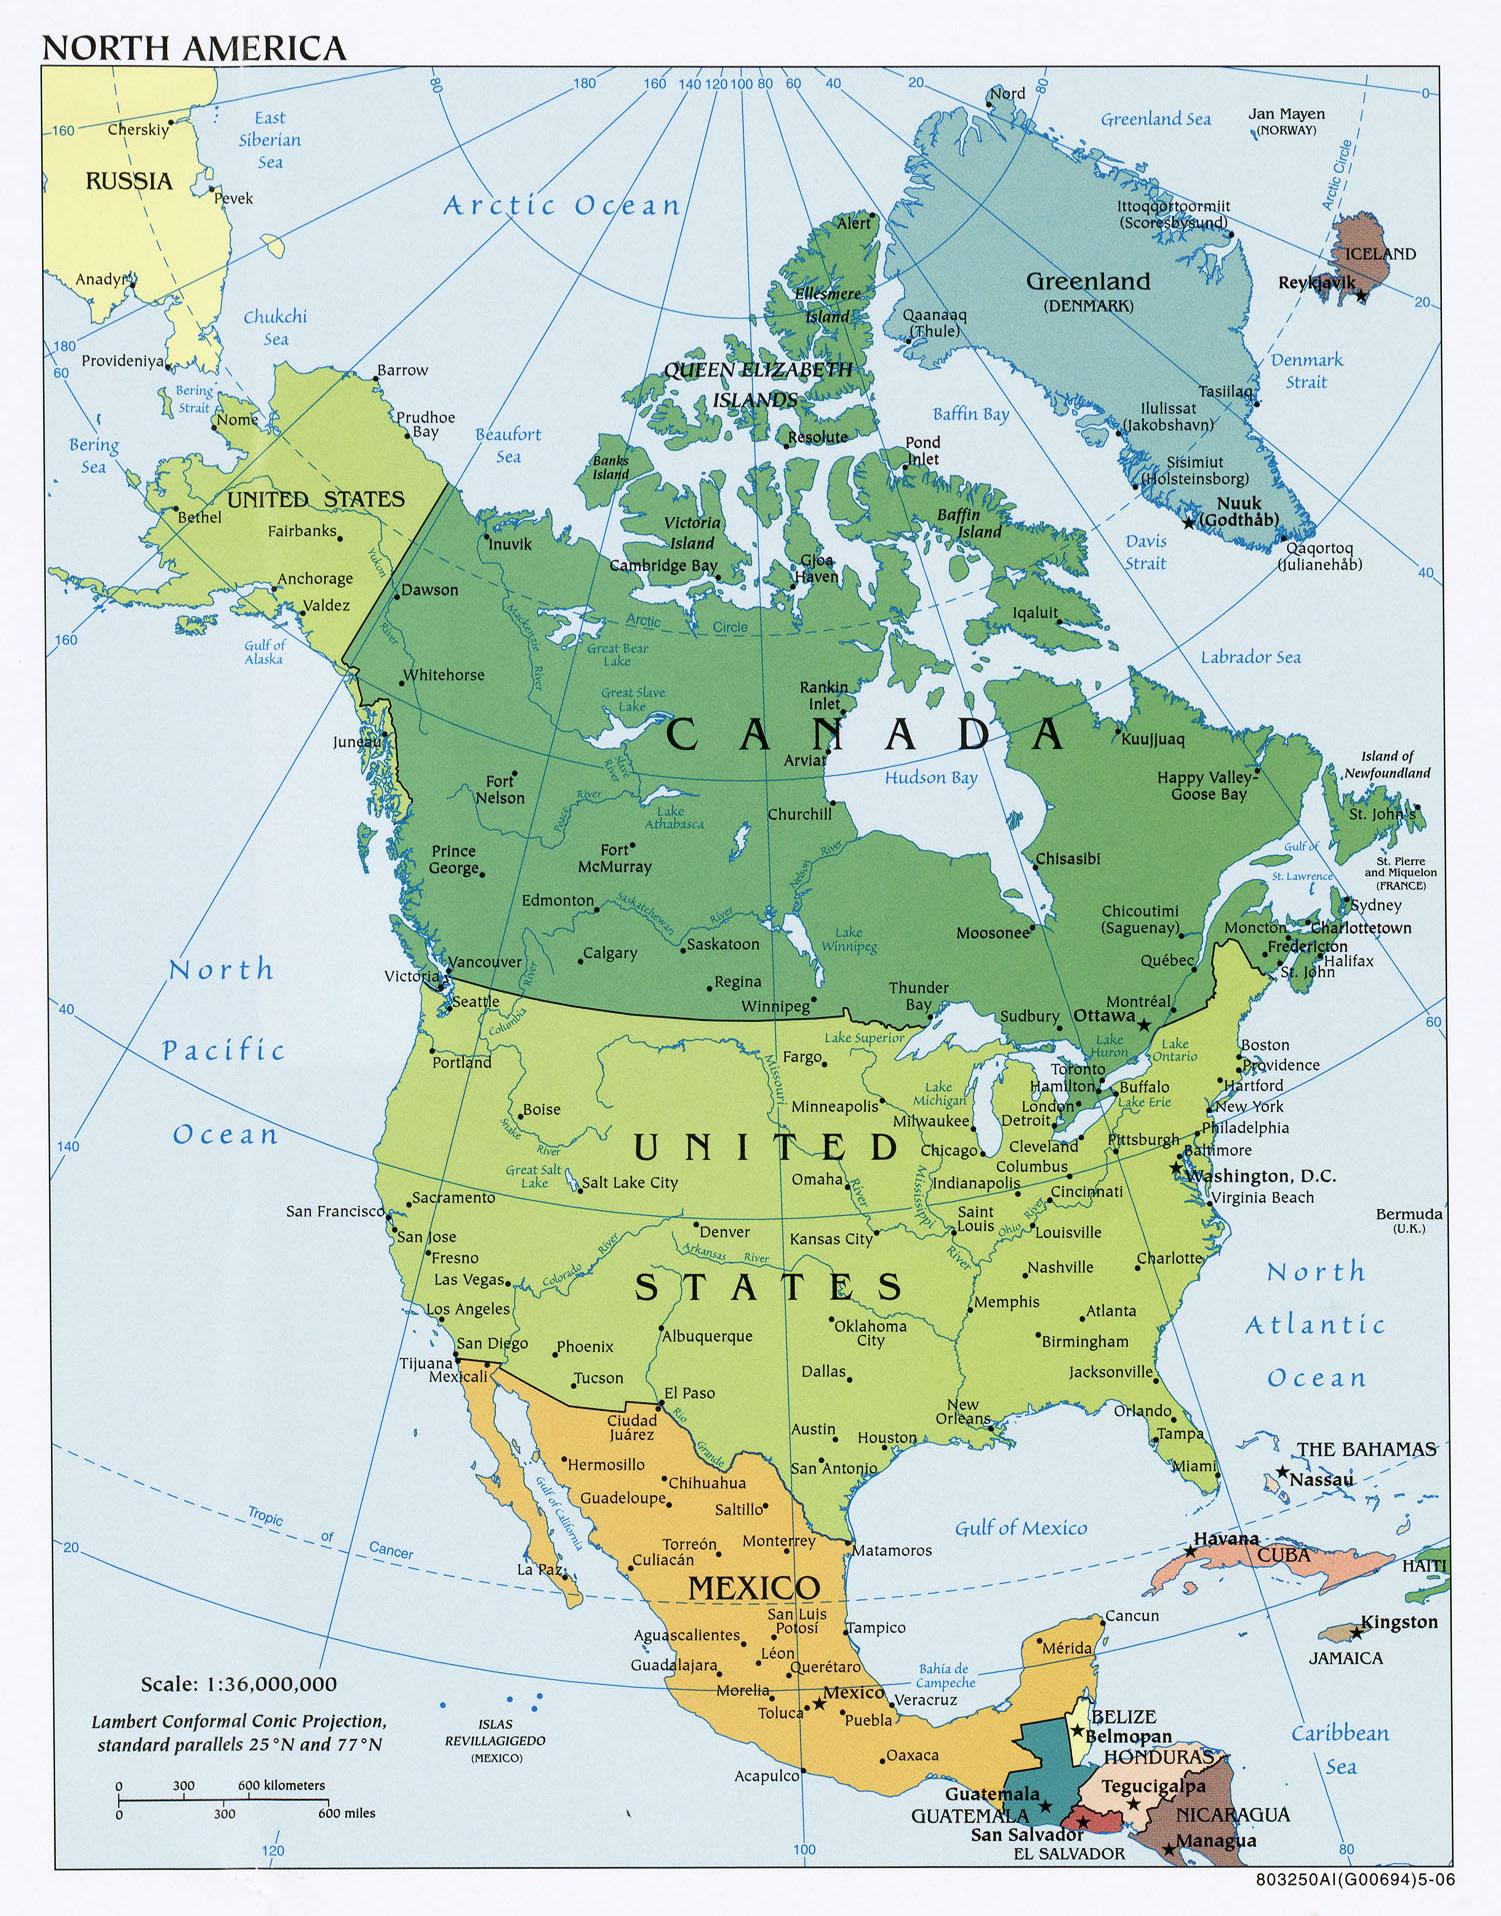 nordamerika-politisch.jpg WELTKARTE NORDAMERIKA